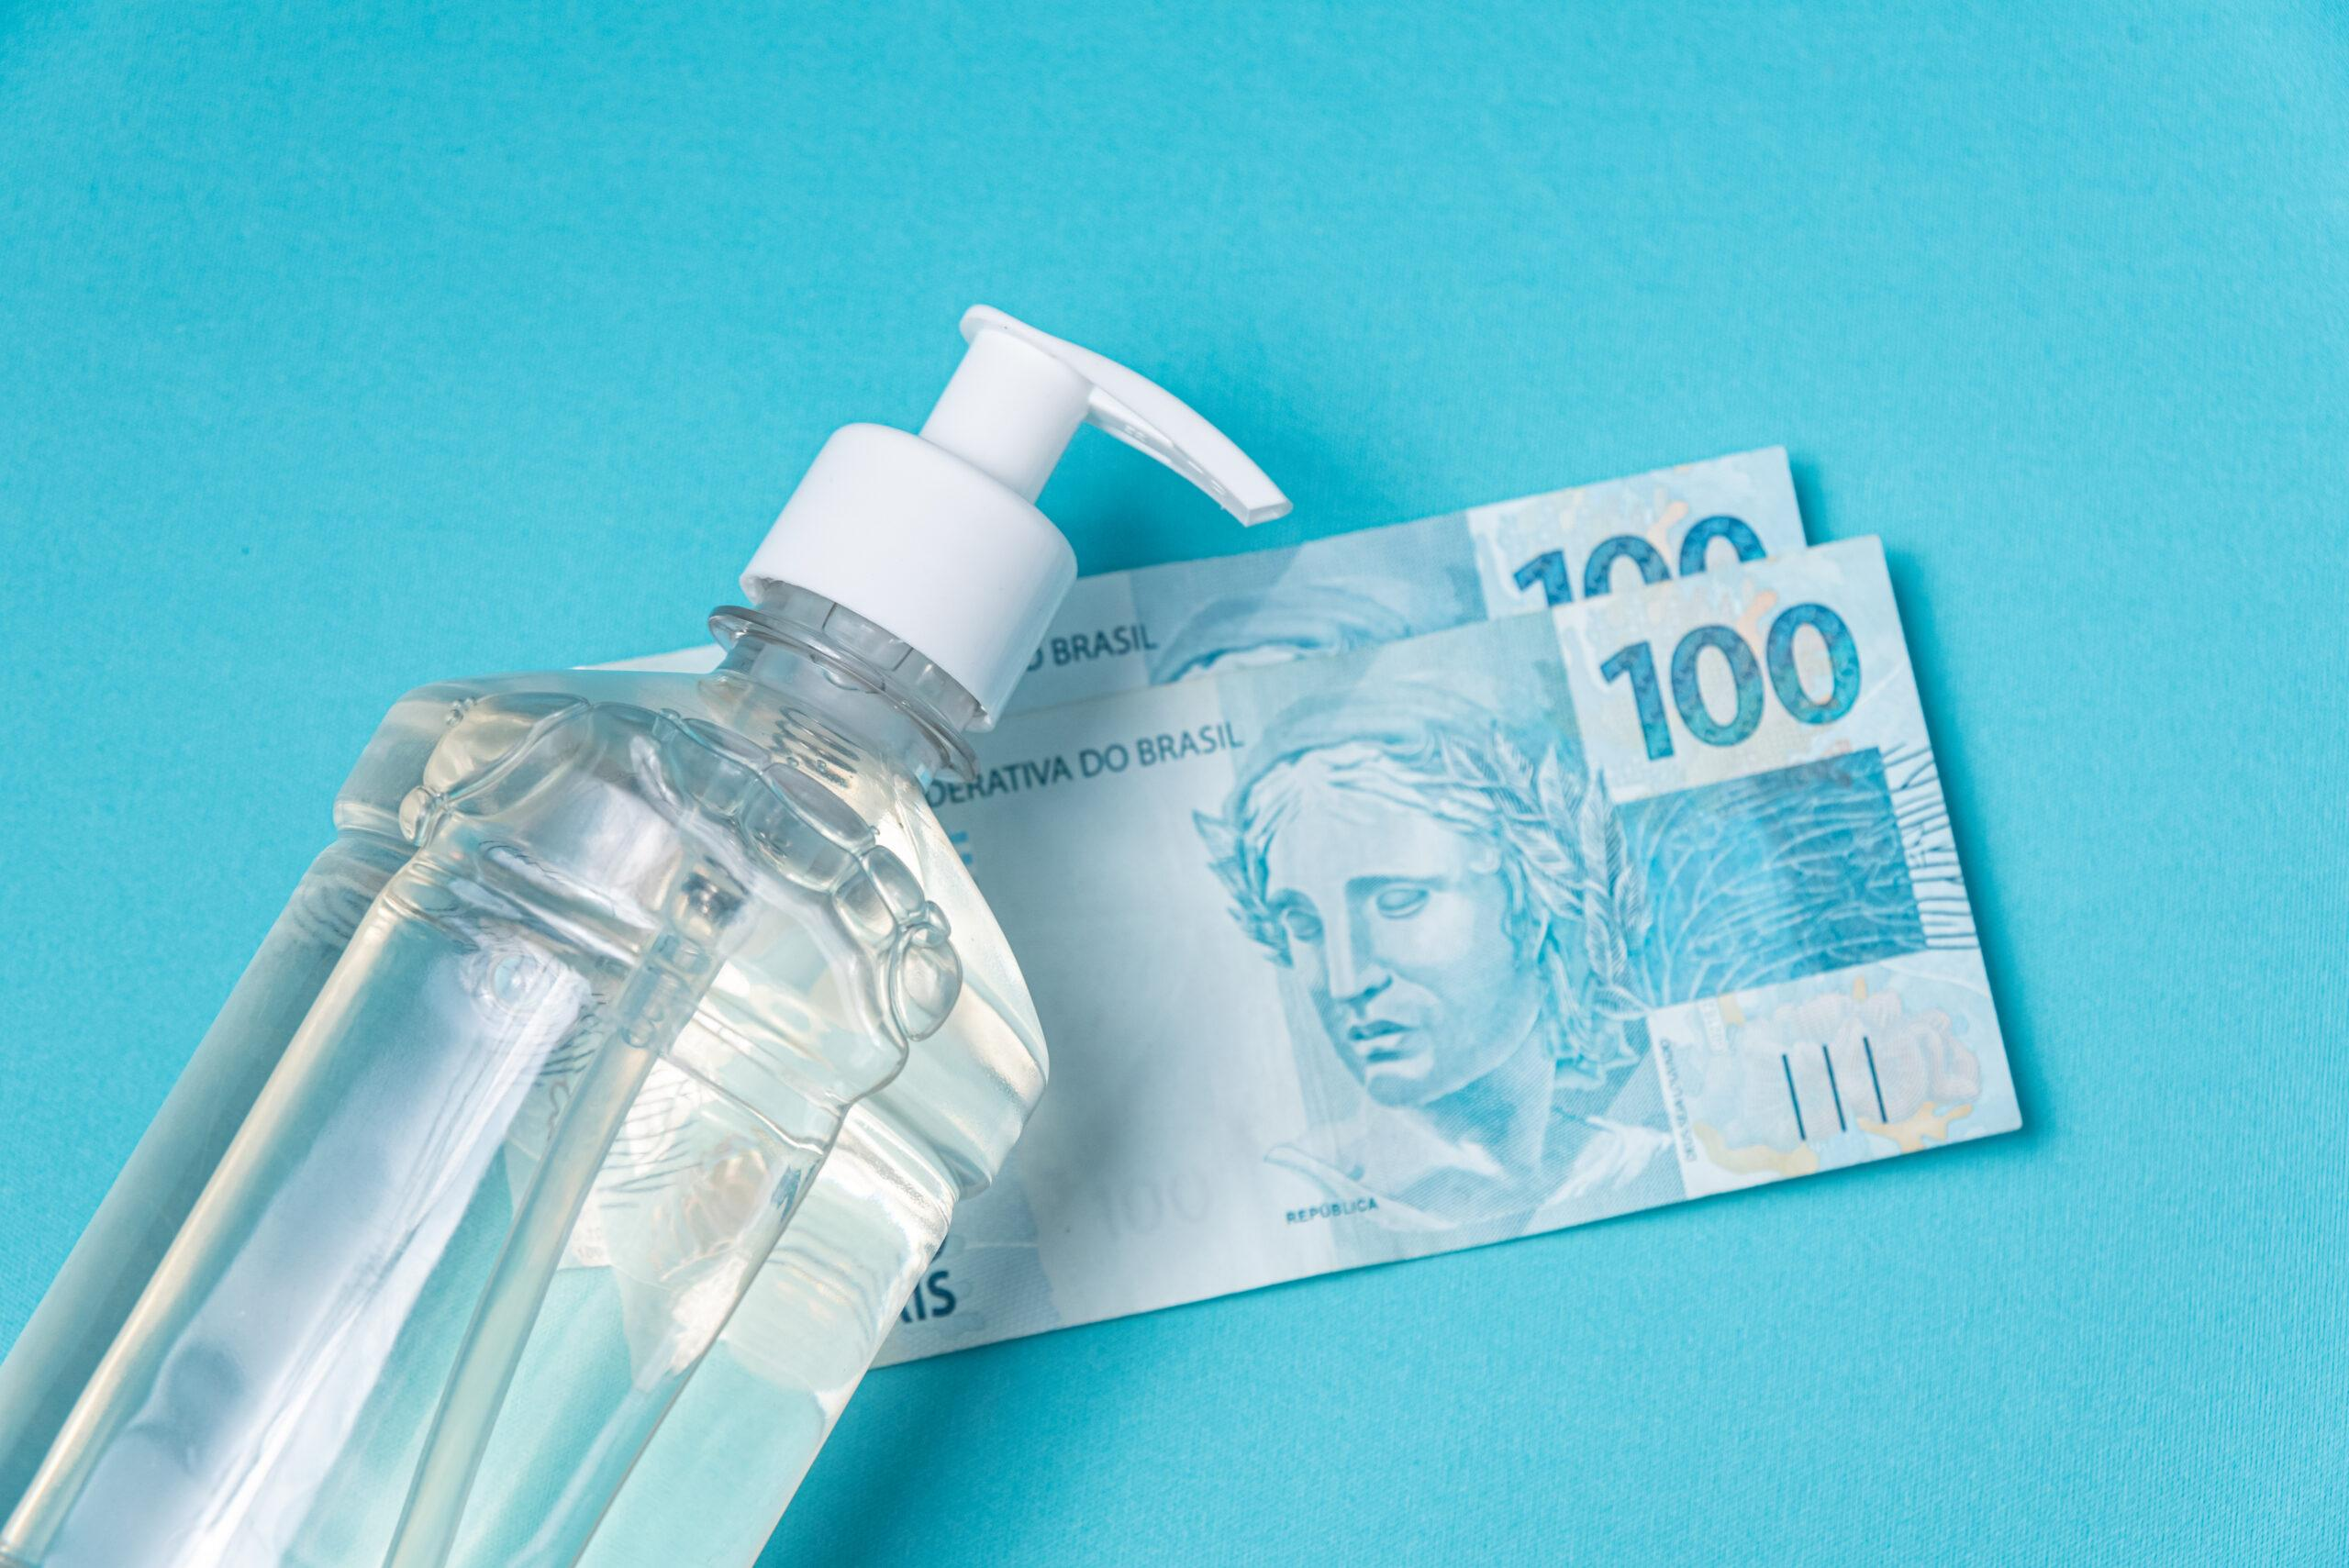 Álcool gel e notas de R$ 100